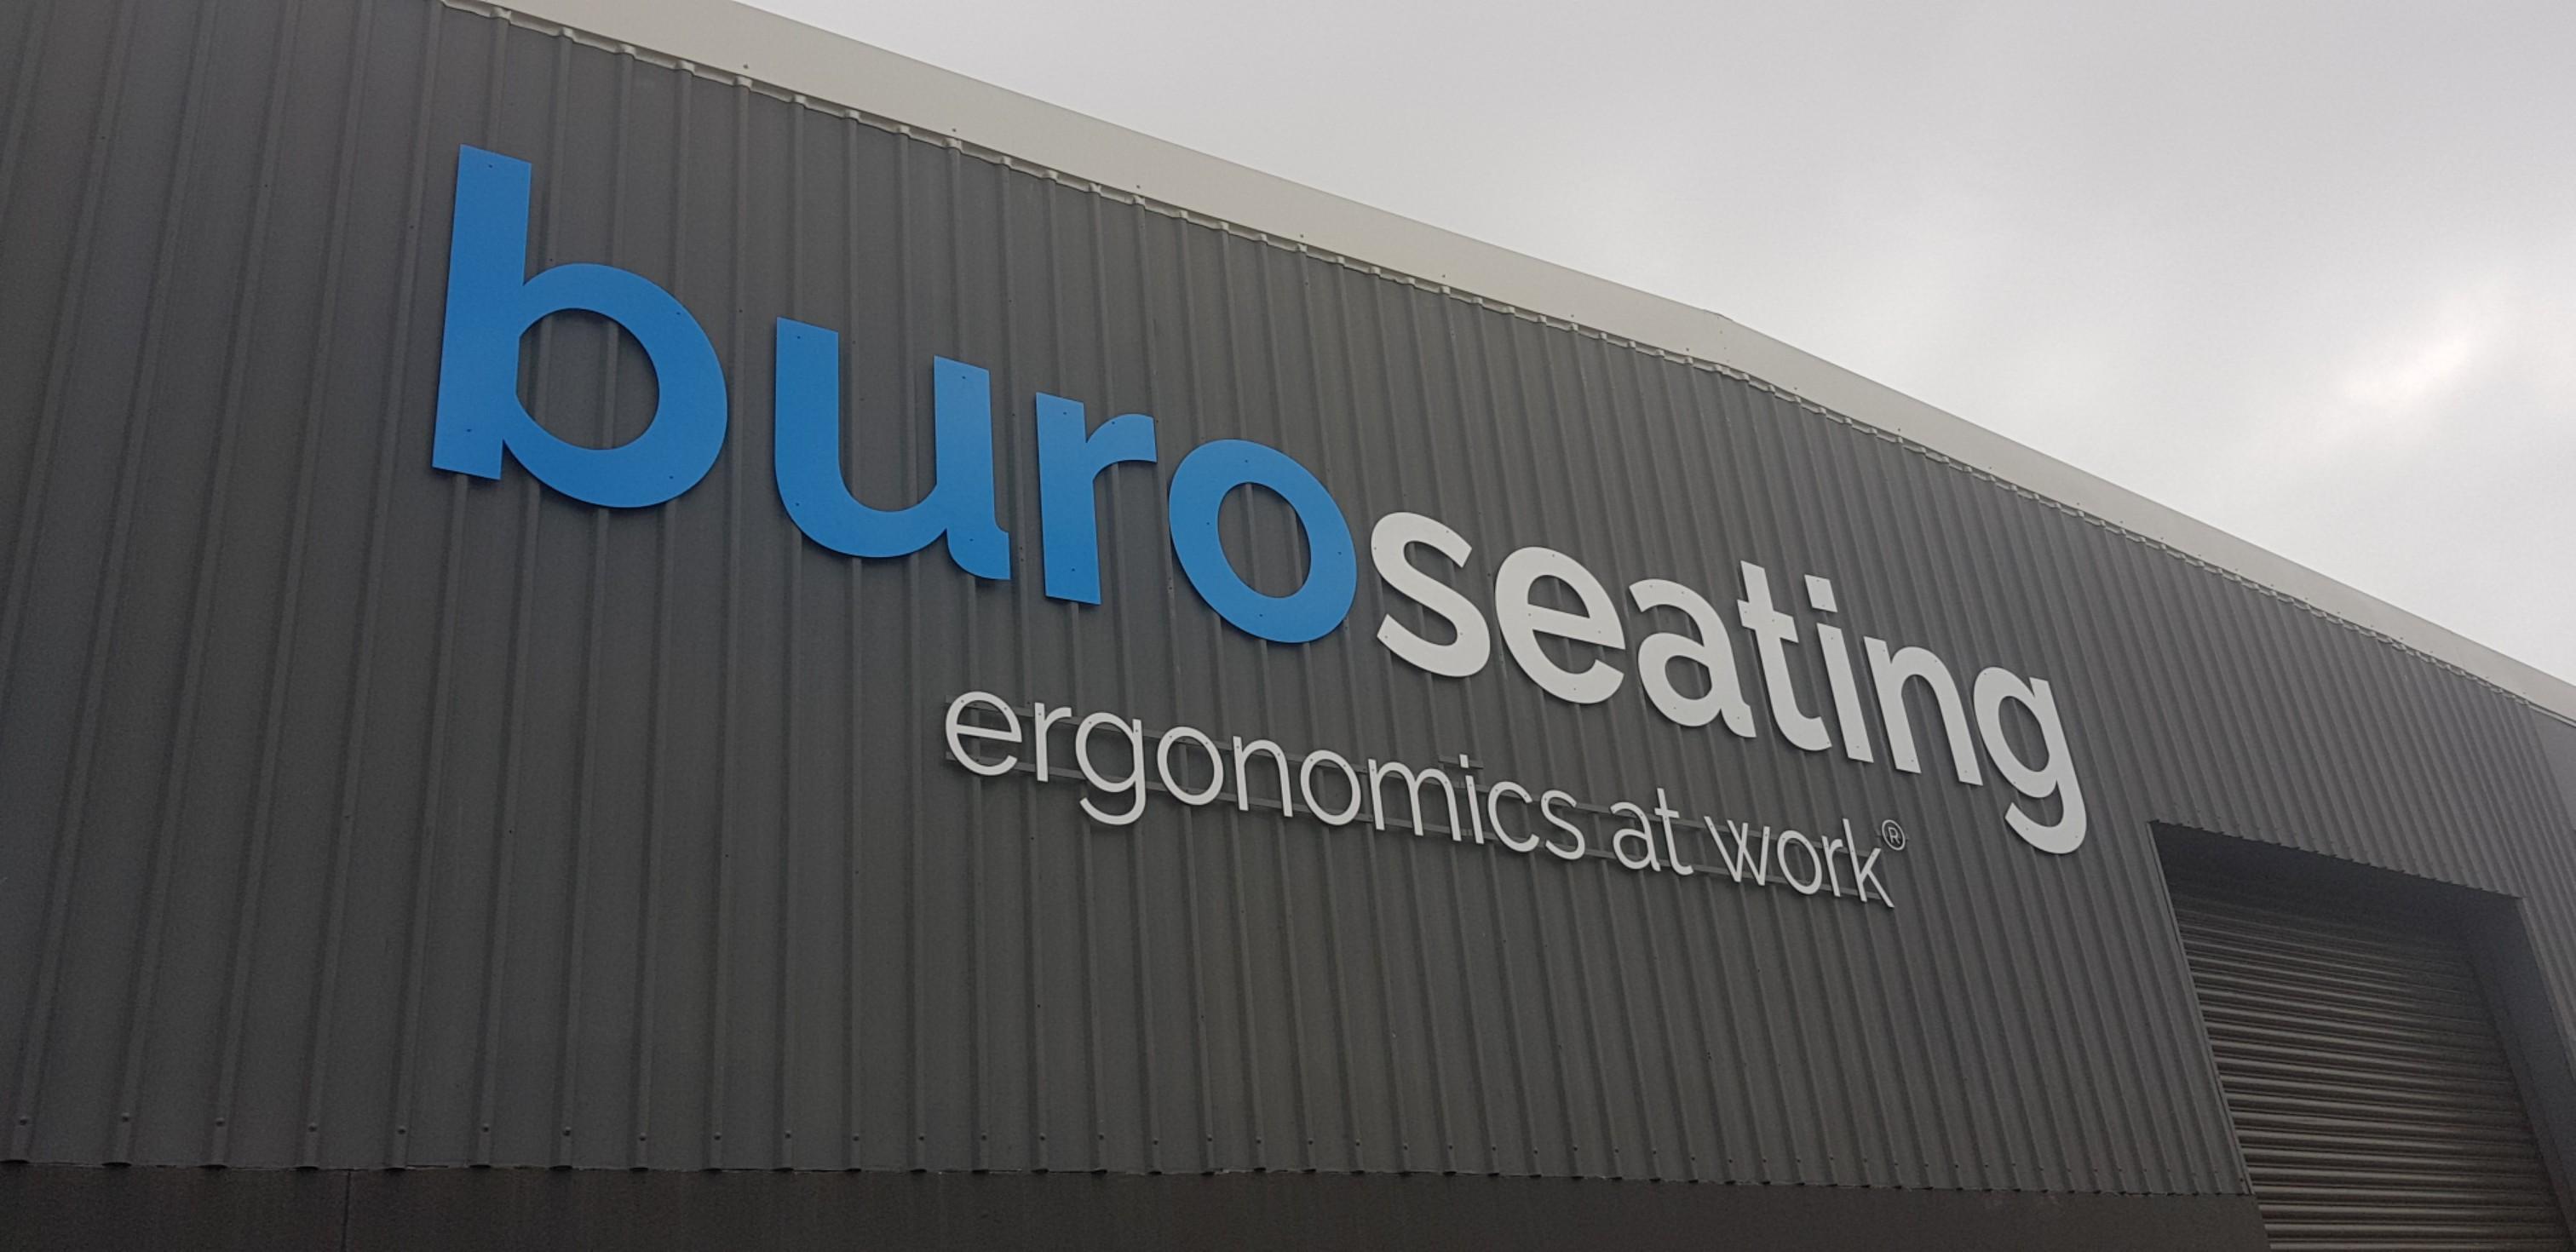 BURO 3D building Signage 2